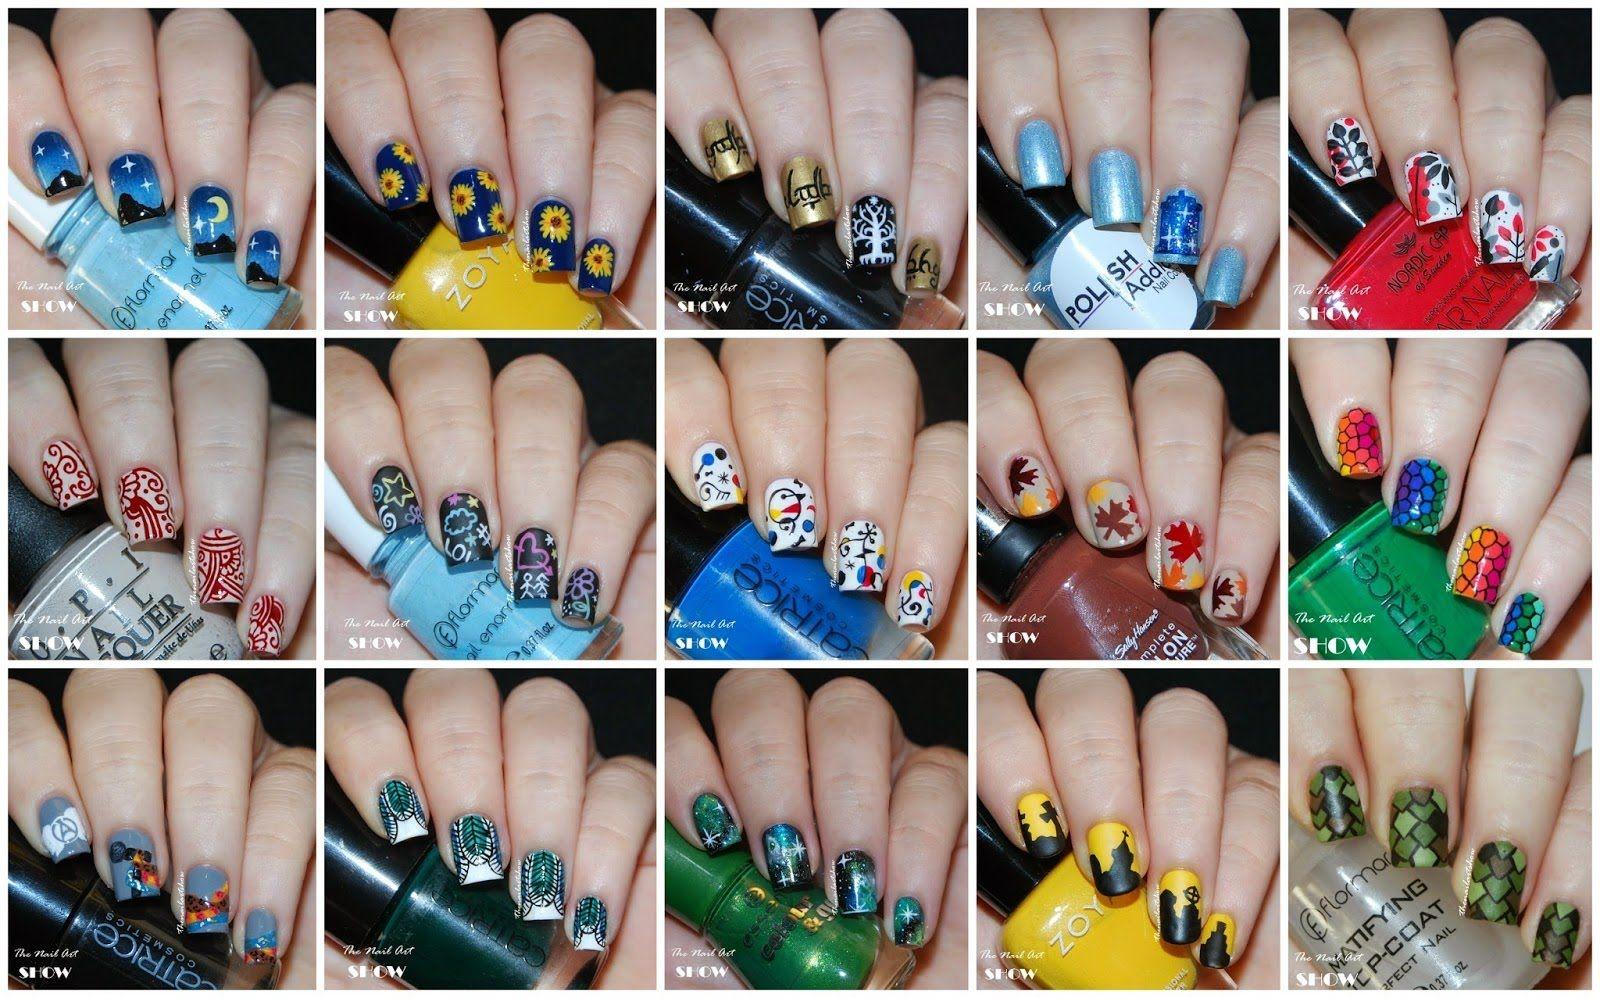 Nail Art Designs Compilation |Colorful| ☆ Nagel Art 2015 Part 2 ...